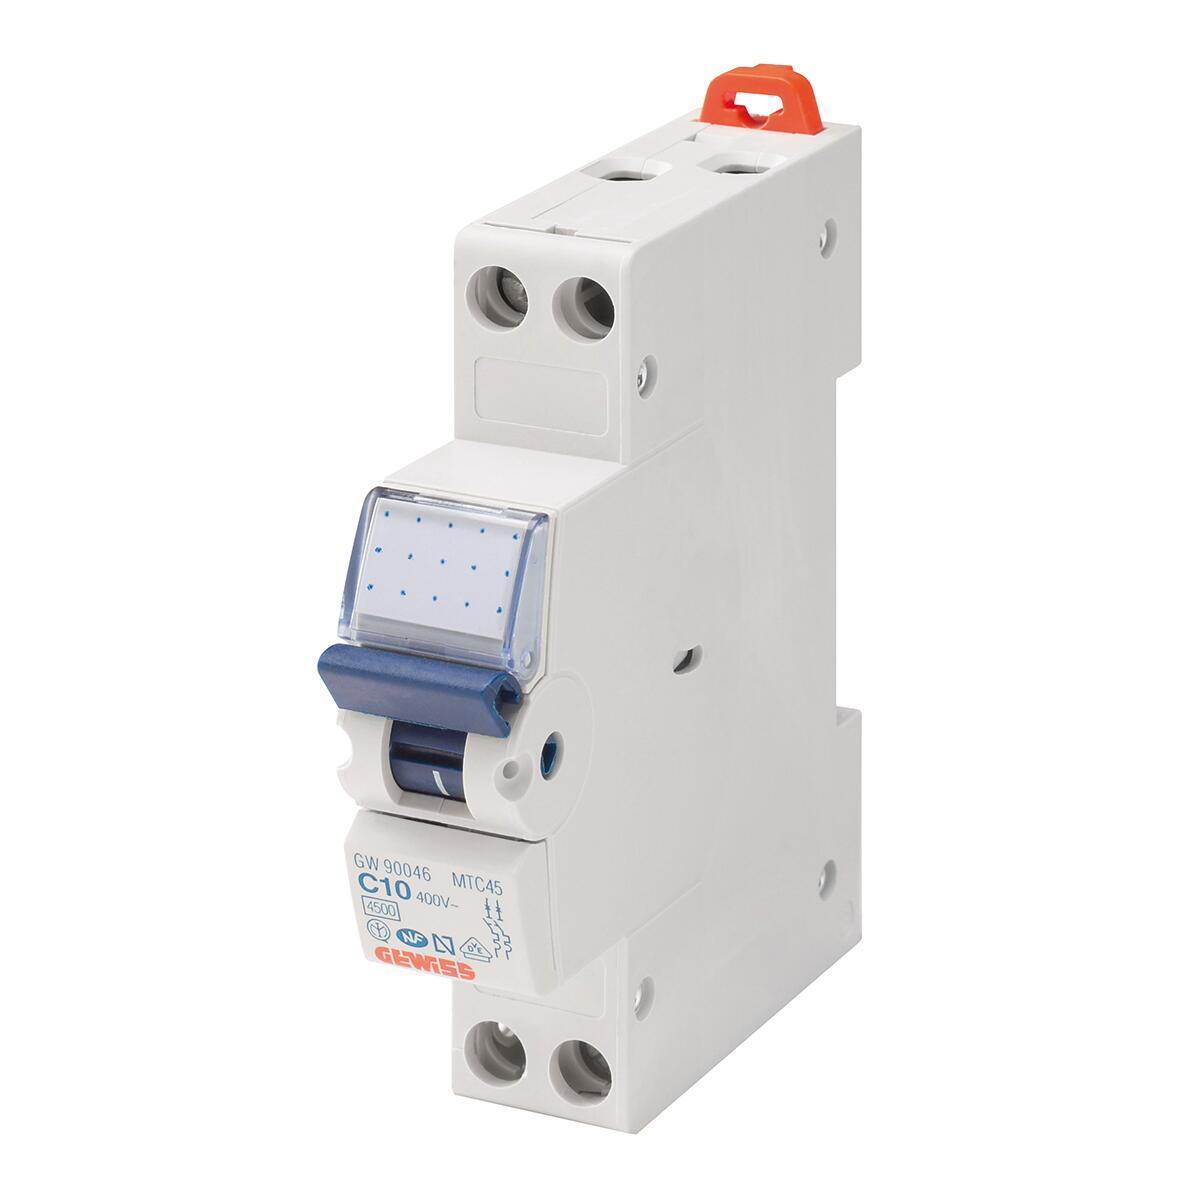 Interruttore magnetotermico GEWISS GW90028 1P +N 20A 4.5kA C 1 modulo 230V